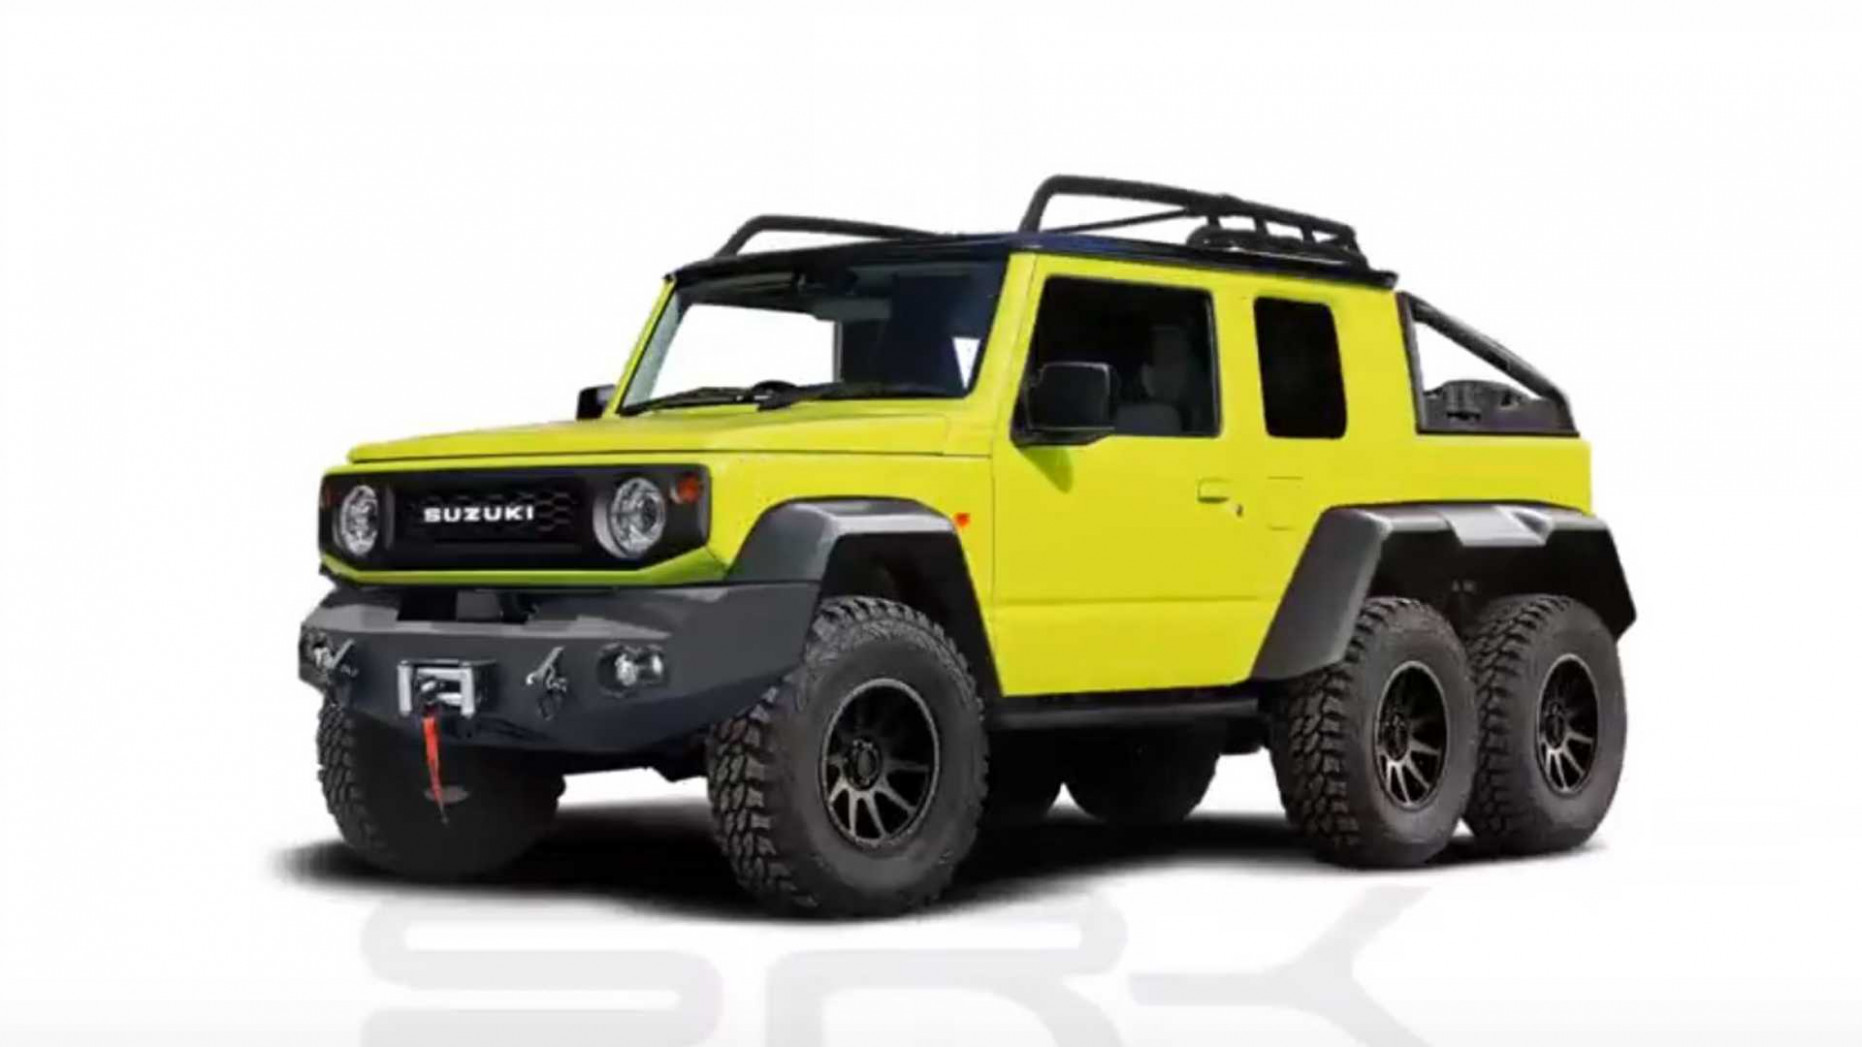 Release Date and Concept Suzuki Jimny Model